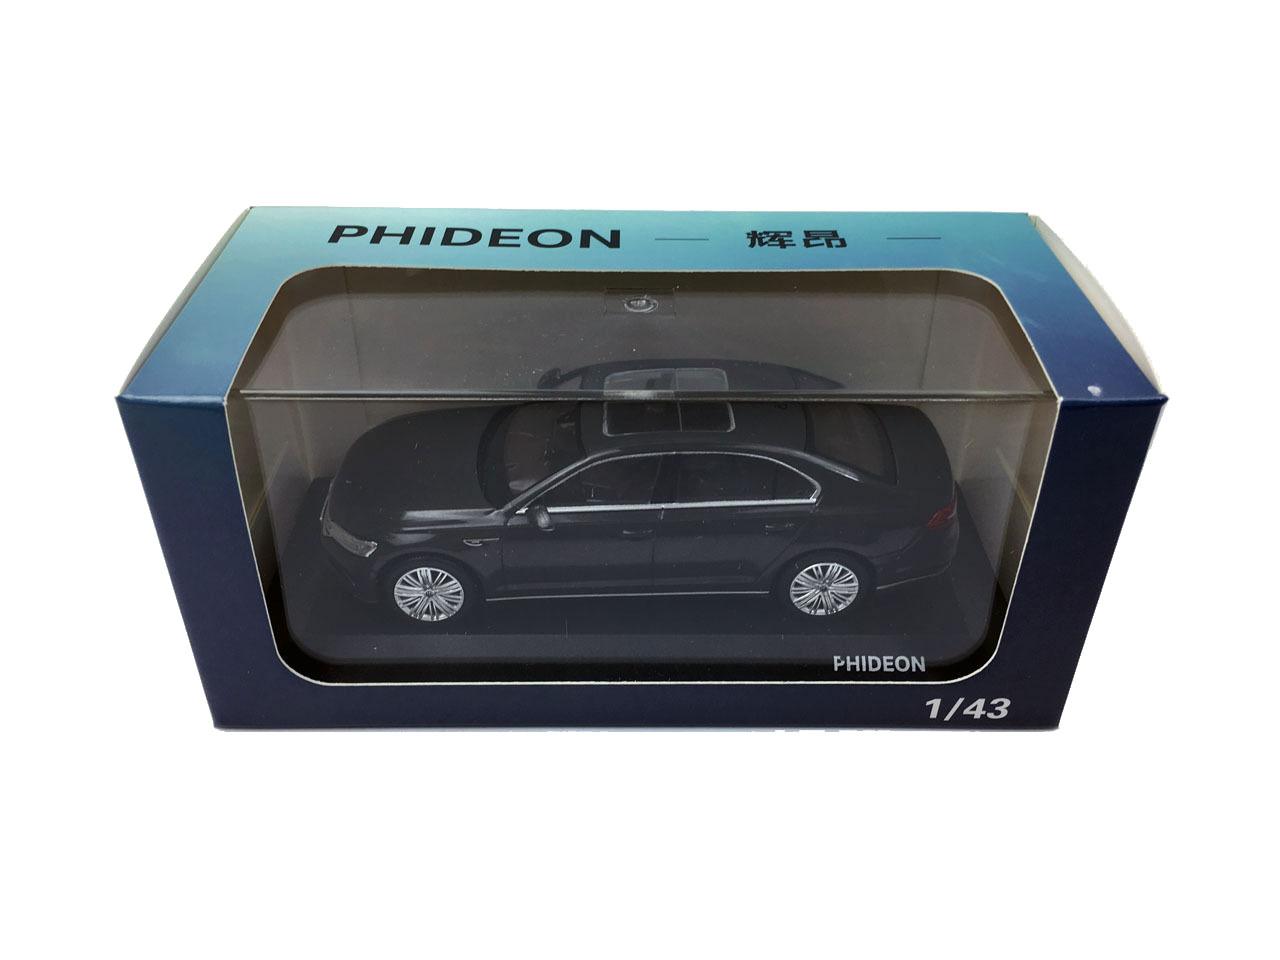 Volkswagen Phideon 2016 1/43 Scale Die-cast Model Car Wholesale 6